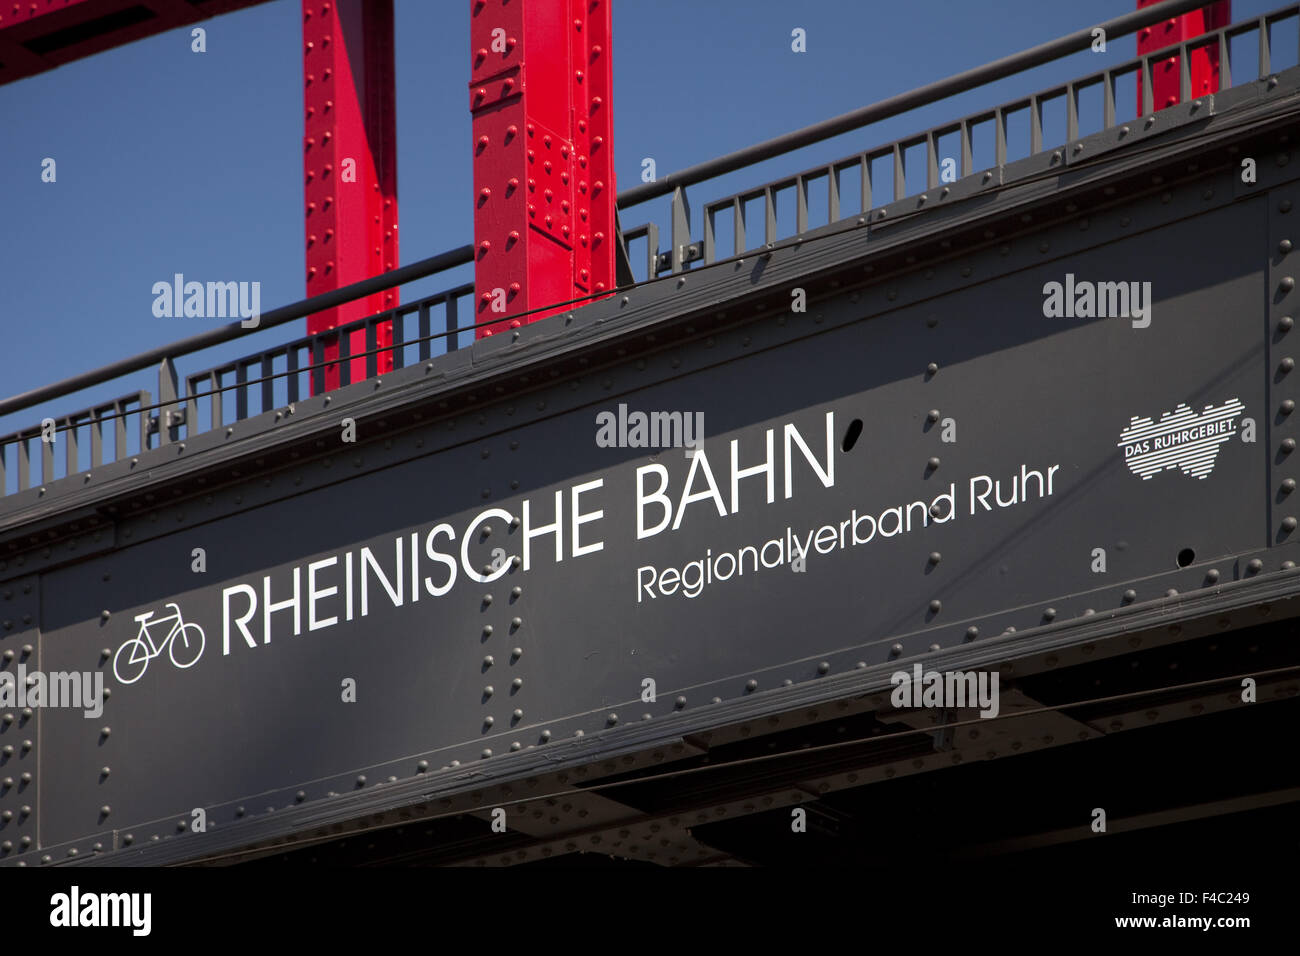 Rhenish railway bridge, Food,, Germany - Stock Image